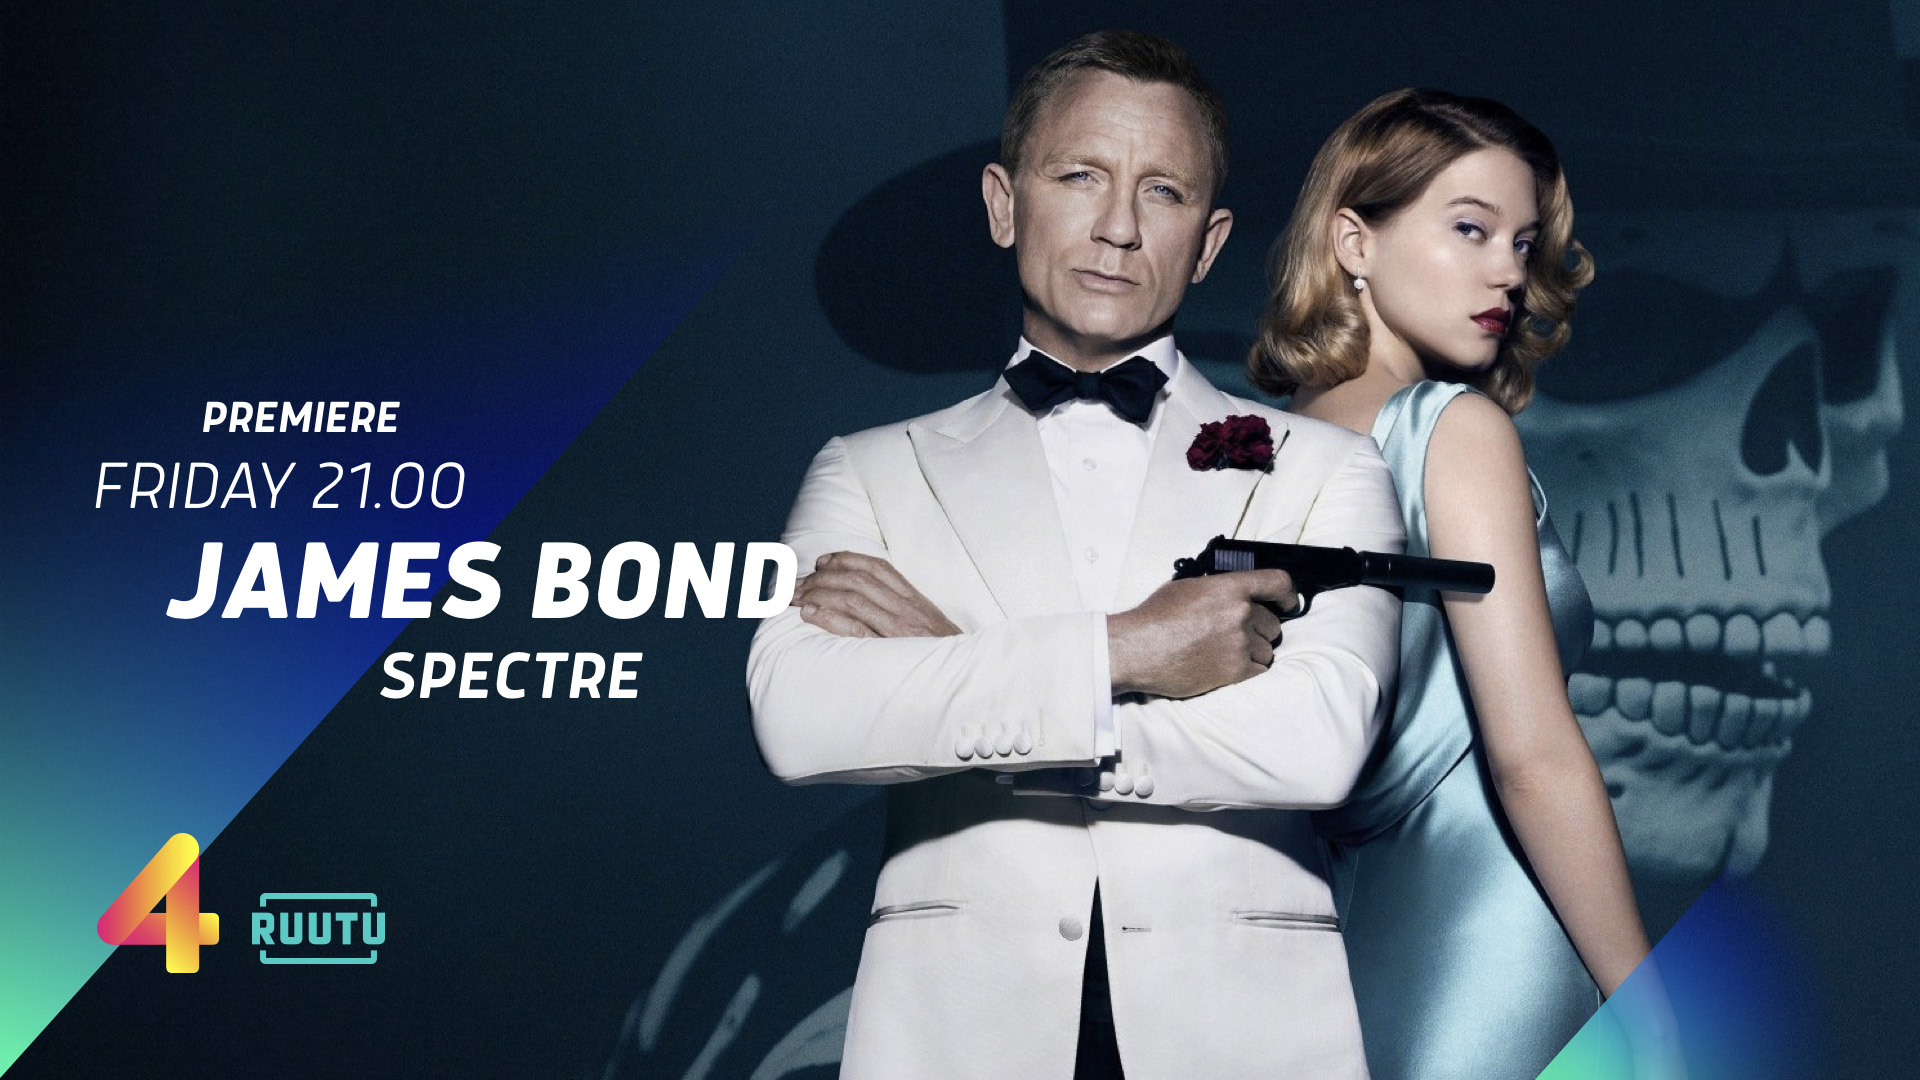 Nelonen James Bond Spectre title system design opener